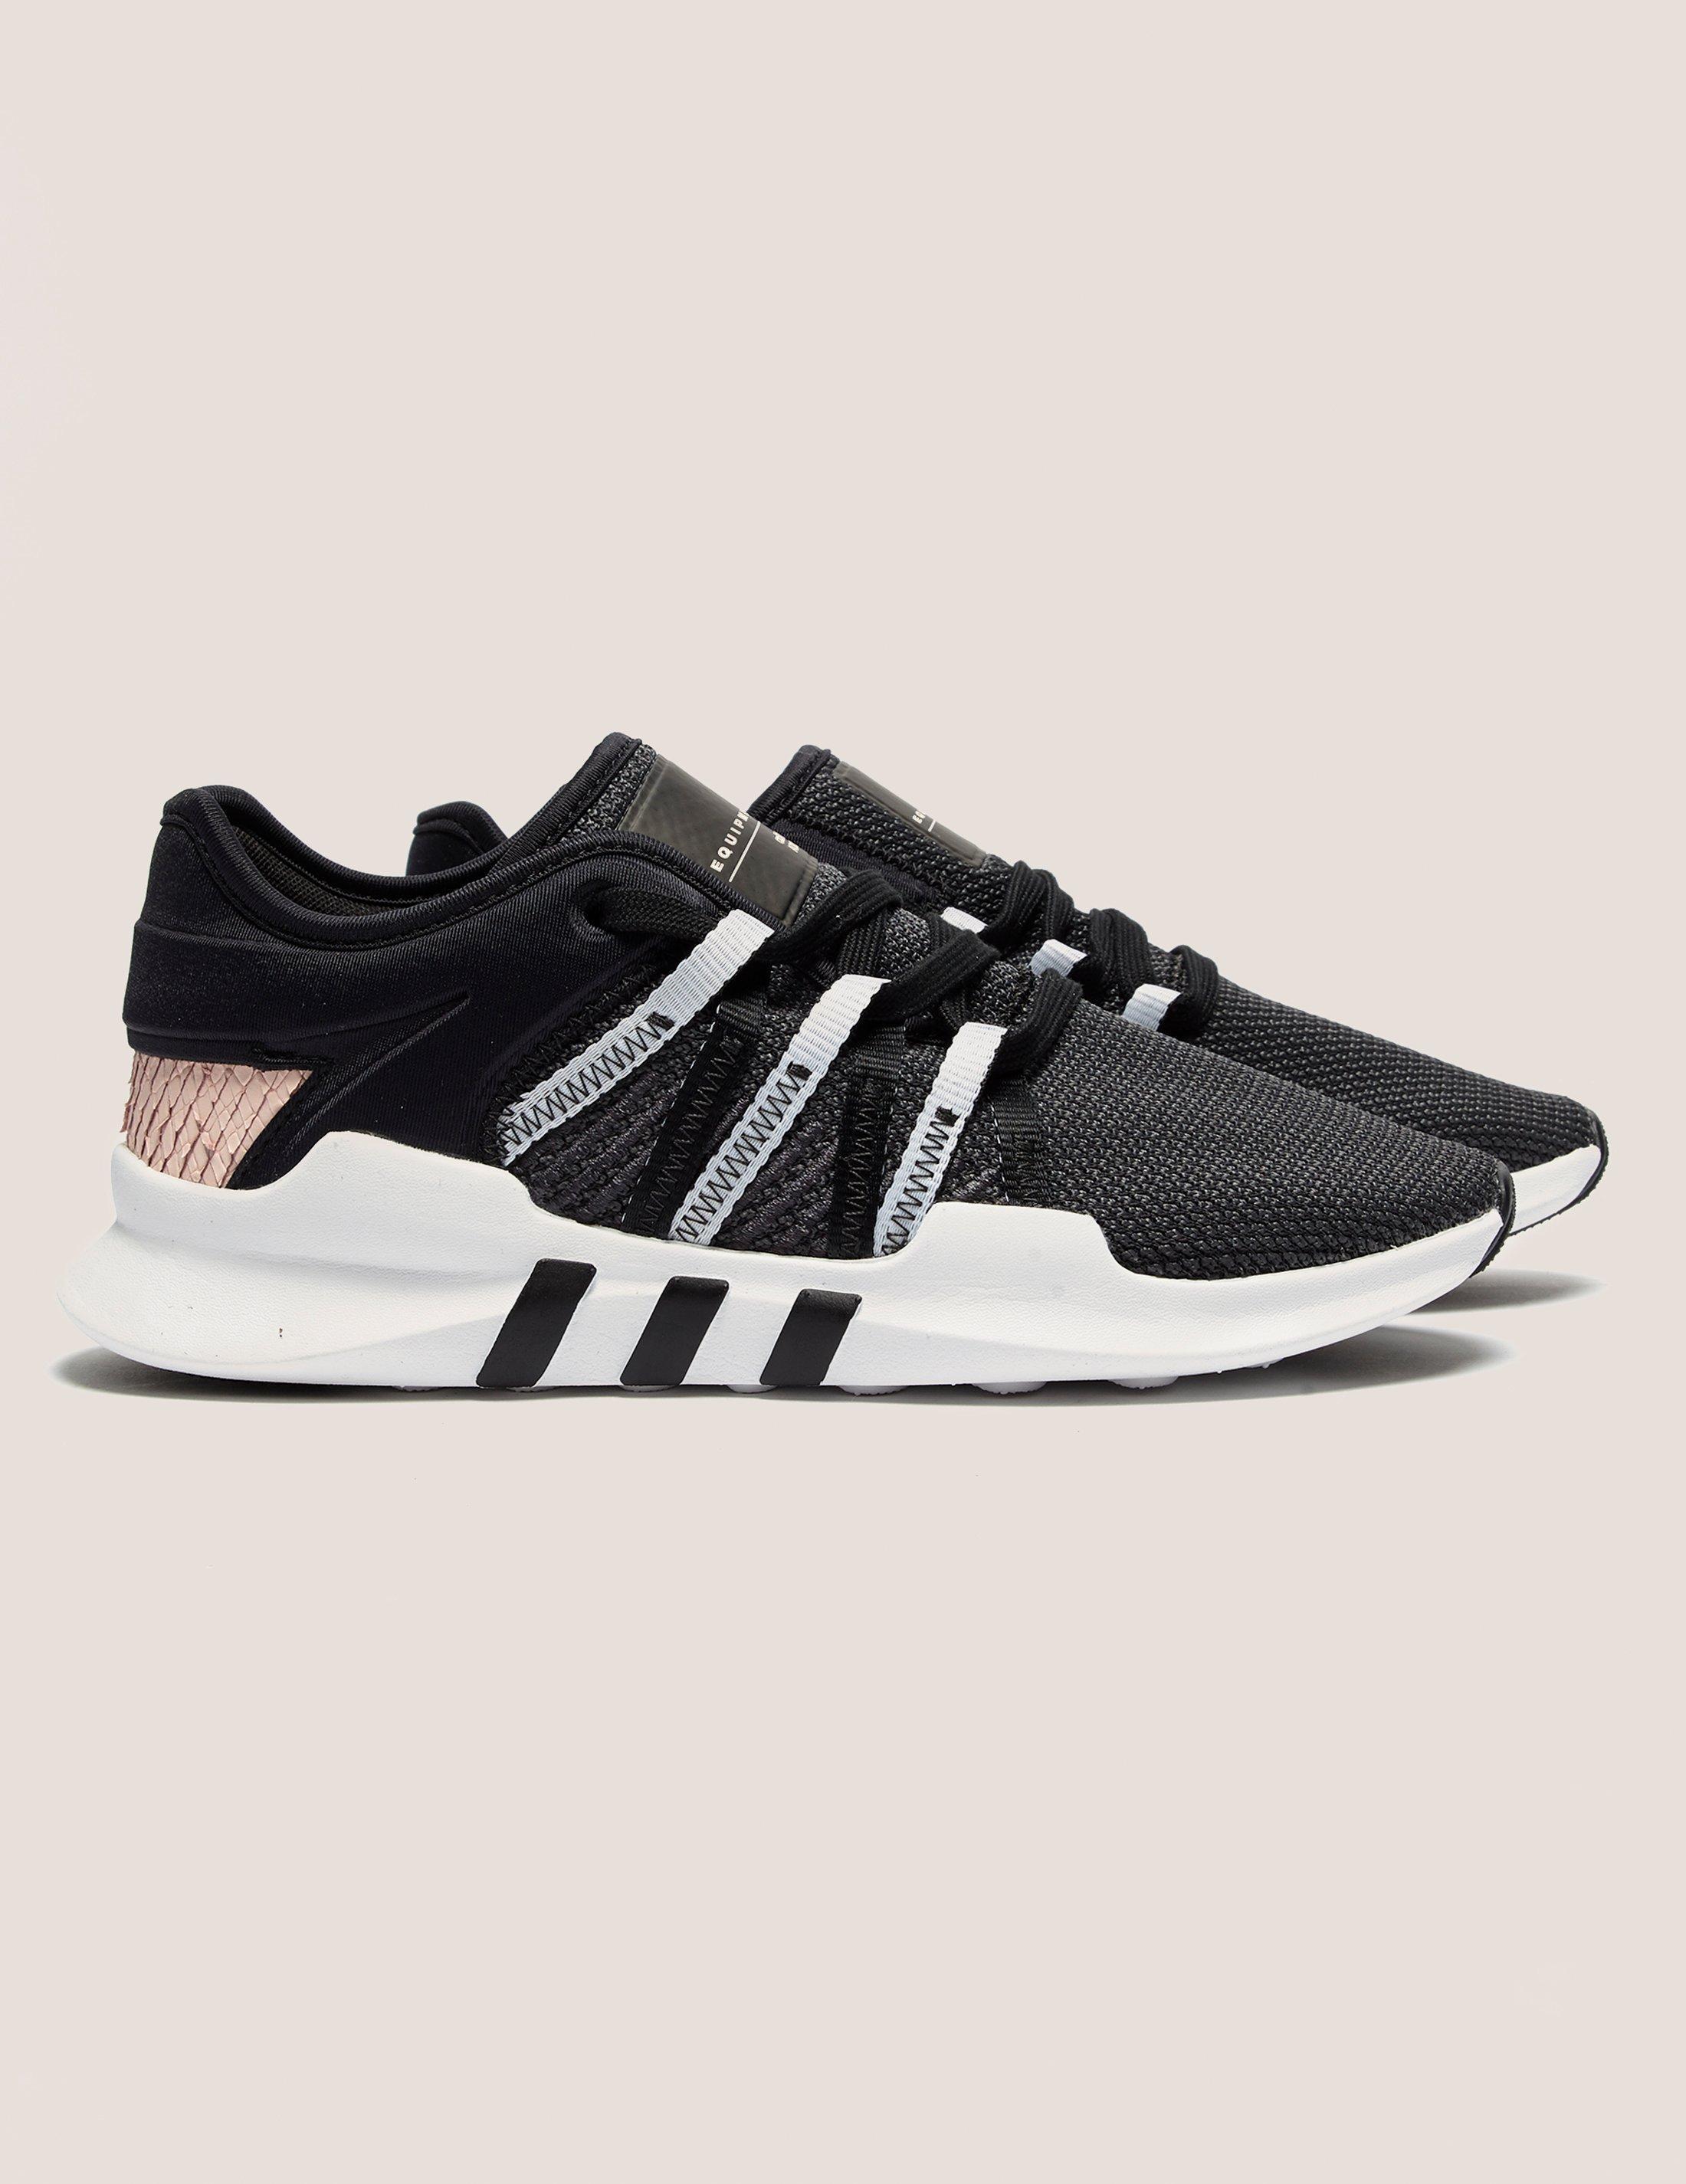 online store 01e27 53d49 ... release date lyst adidas originals womens eqt racing adv womens black  pink e6fa3 5a082